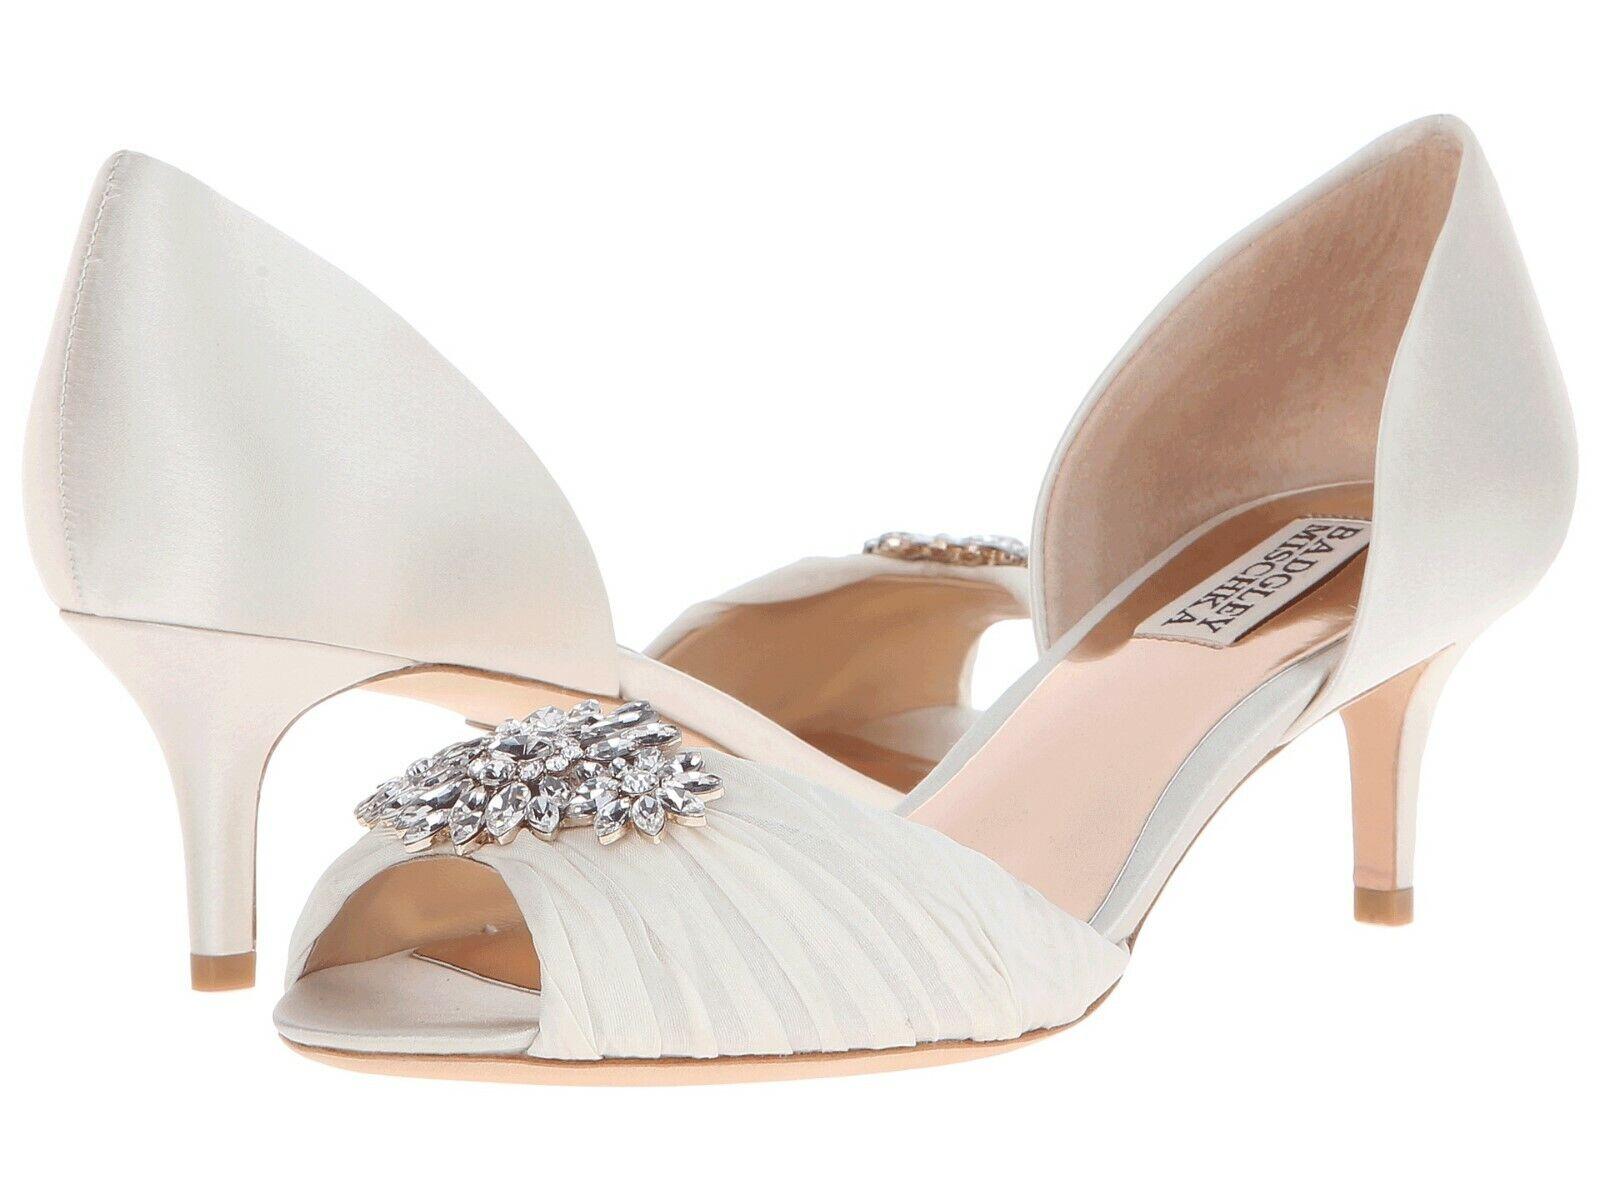 Badgley Mischka Women's Caitlin Crystal Embellished Peep Toe Pump Ivory Size 8.5